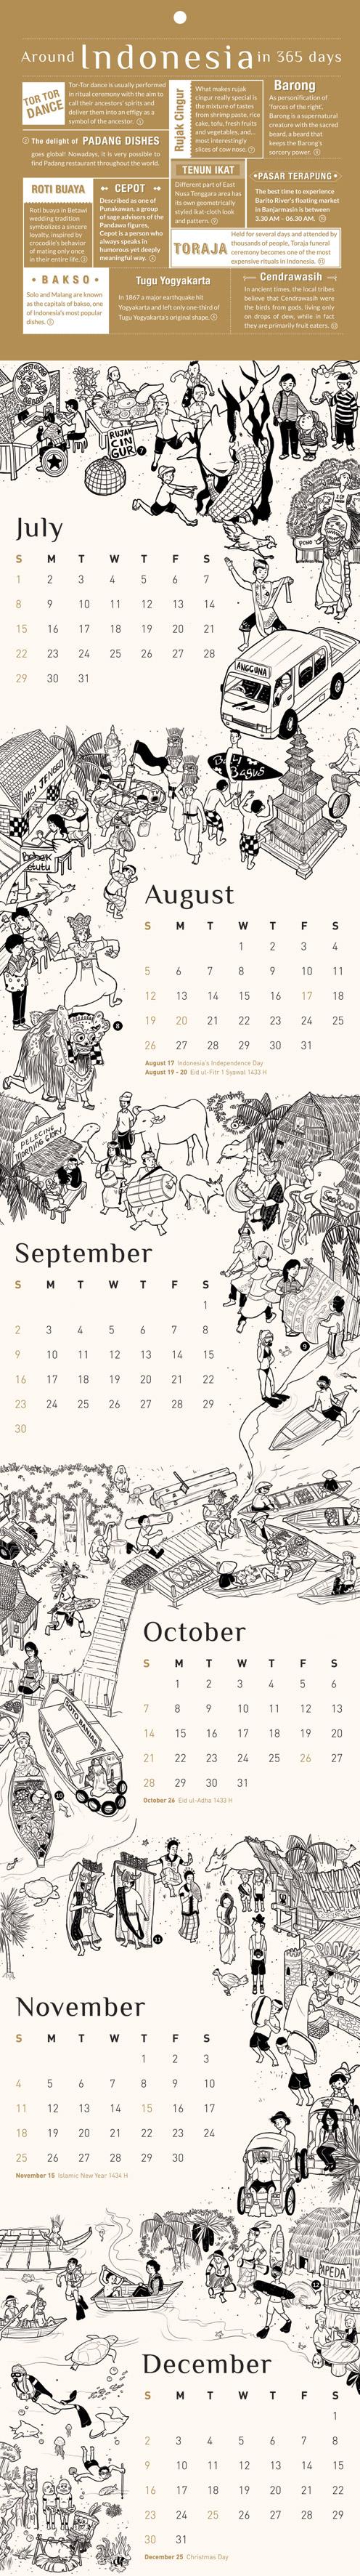 Kineto Calendar 2012 July - December by qbenk